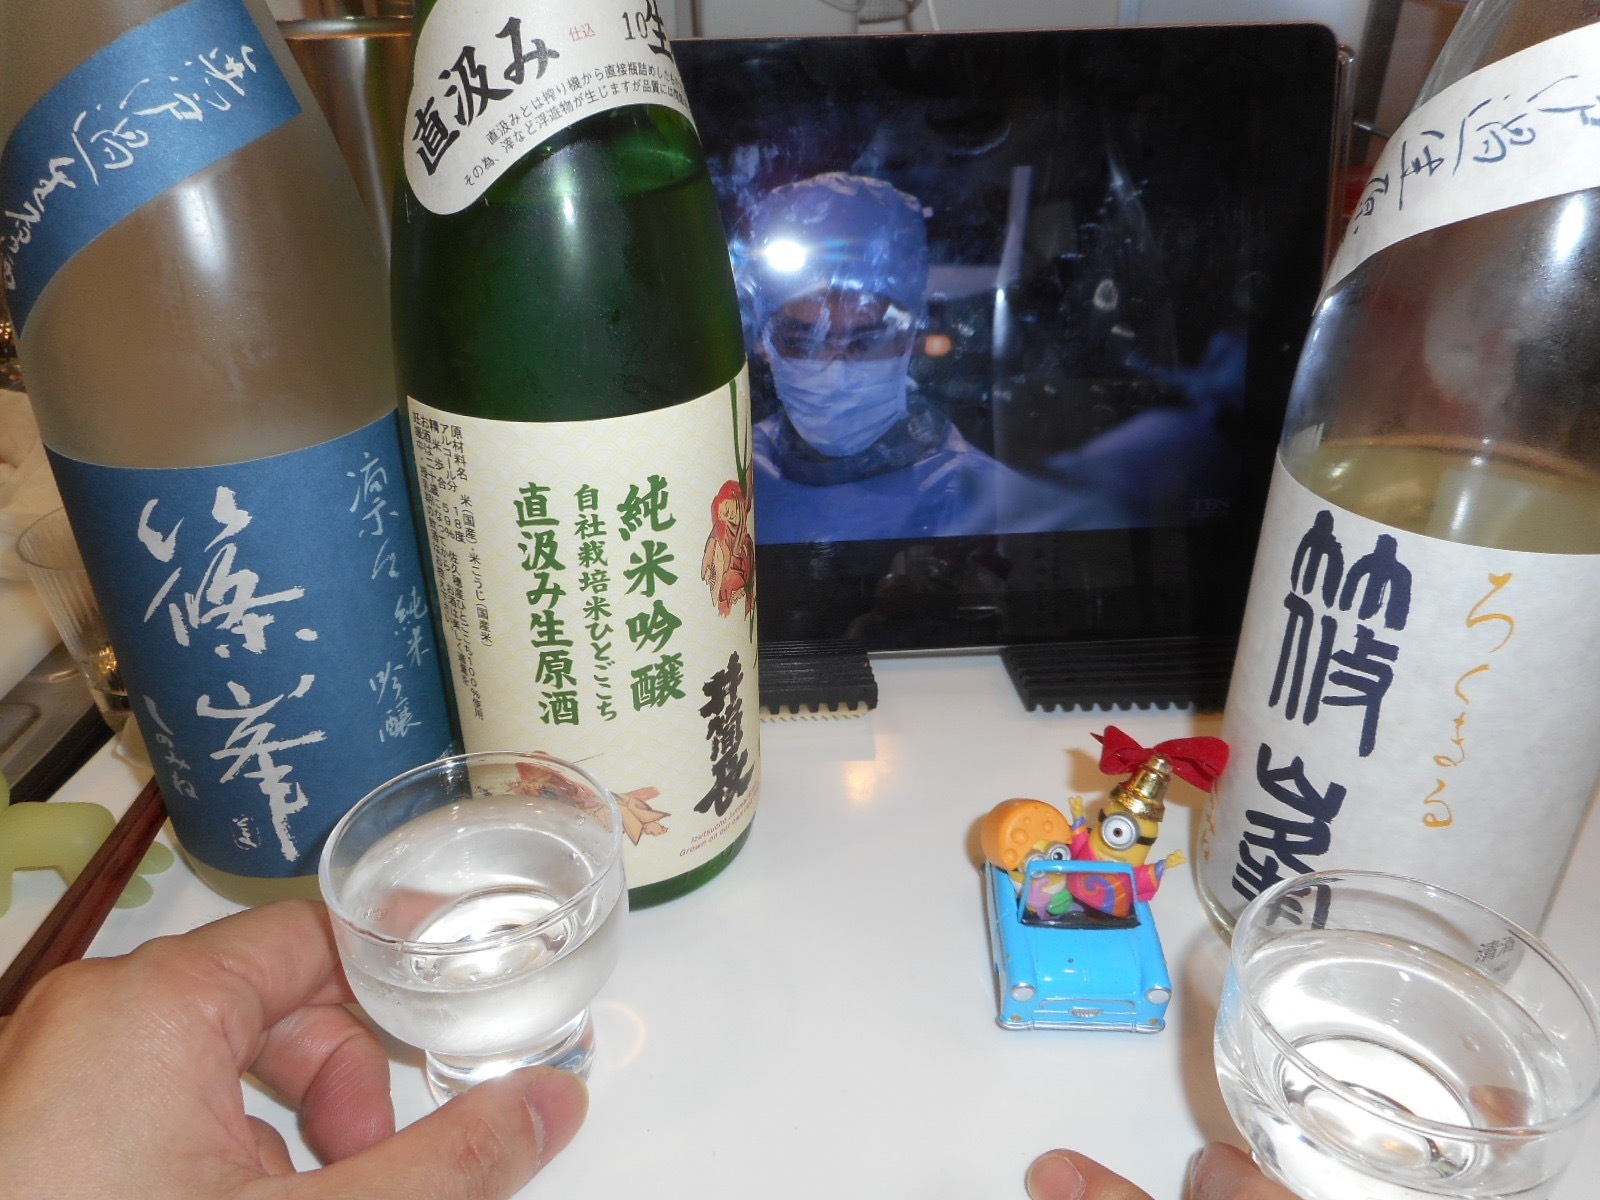 izutsuchou_jikagumi29by2_3.jpg